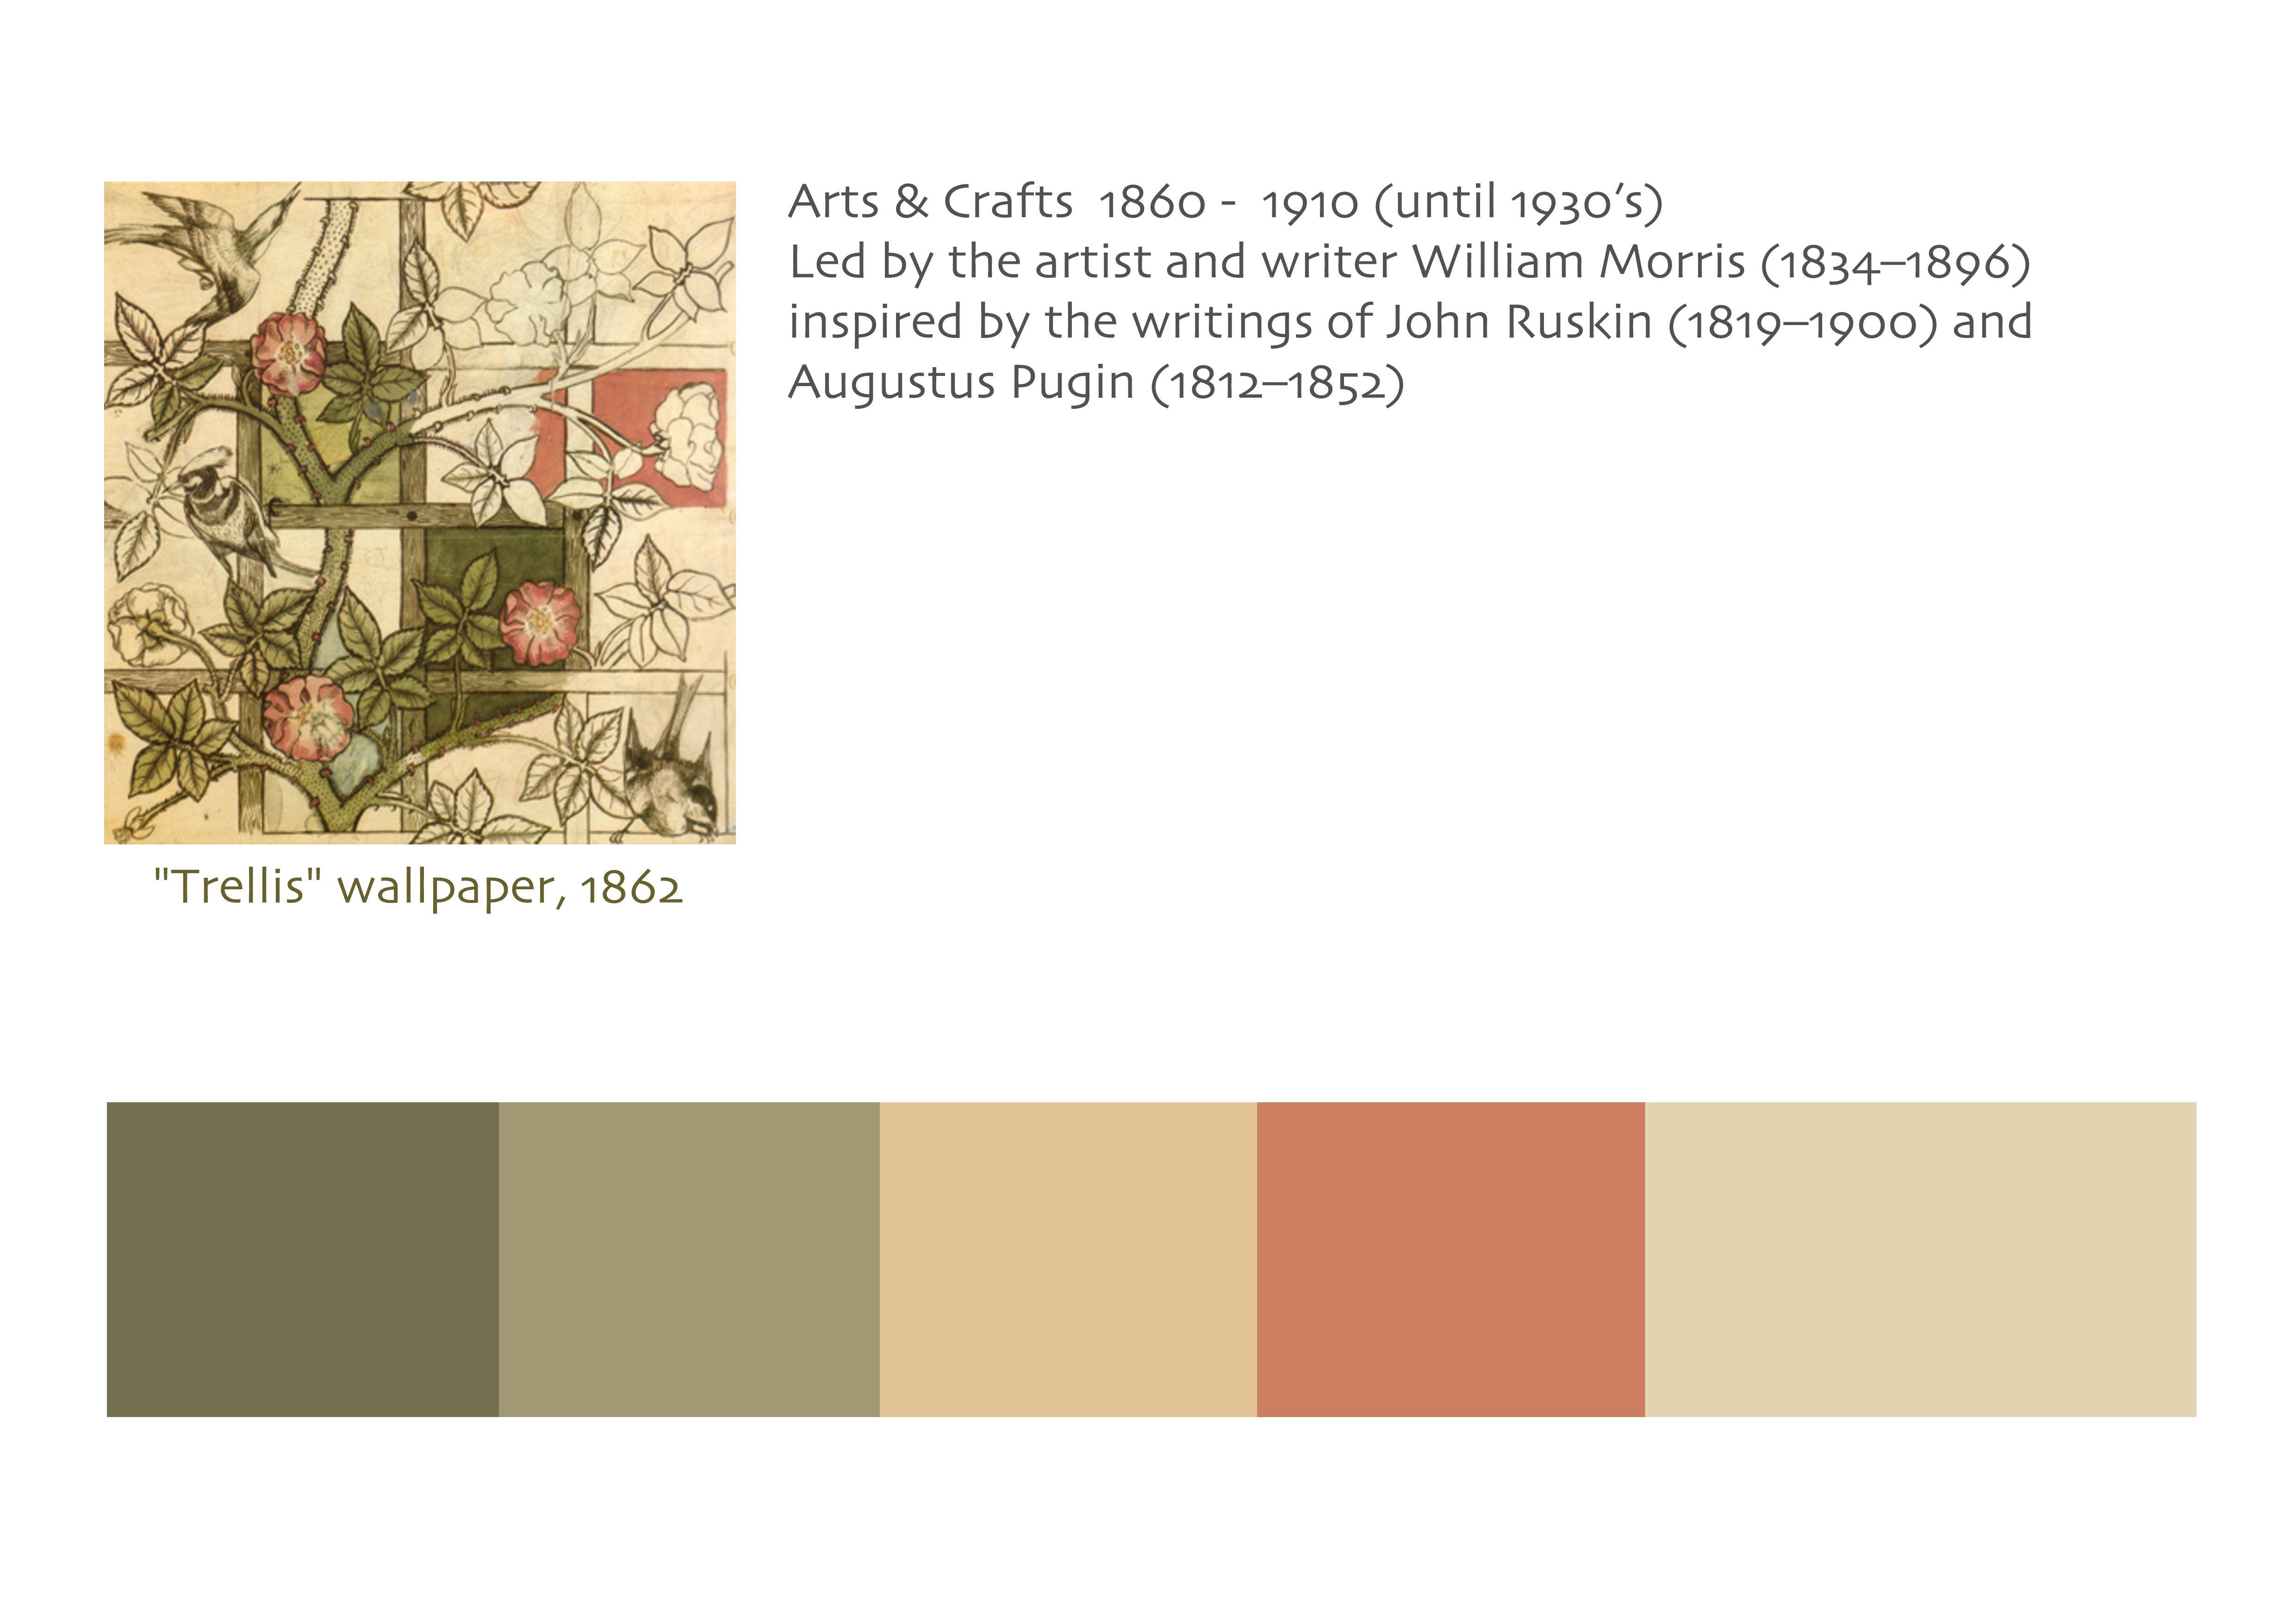 Colour Palette For Arts Crafts Movement 1860 1910 Arts And Crafts Movement Trellis Wallpaper English Art